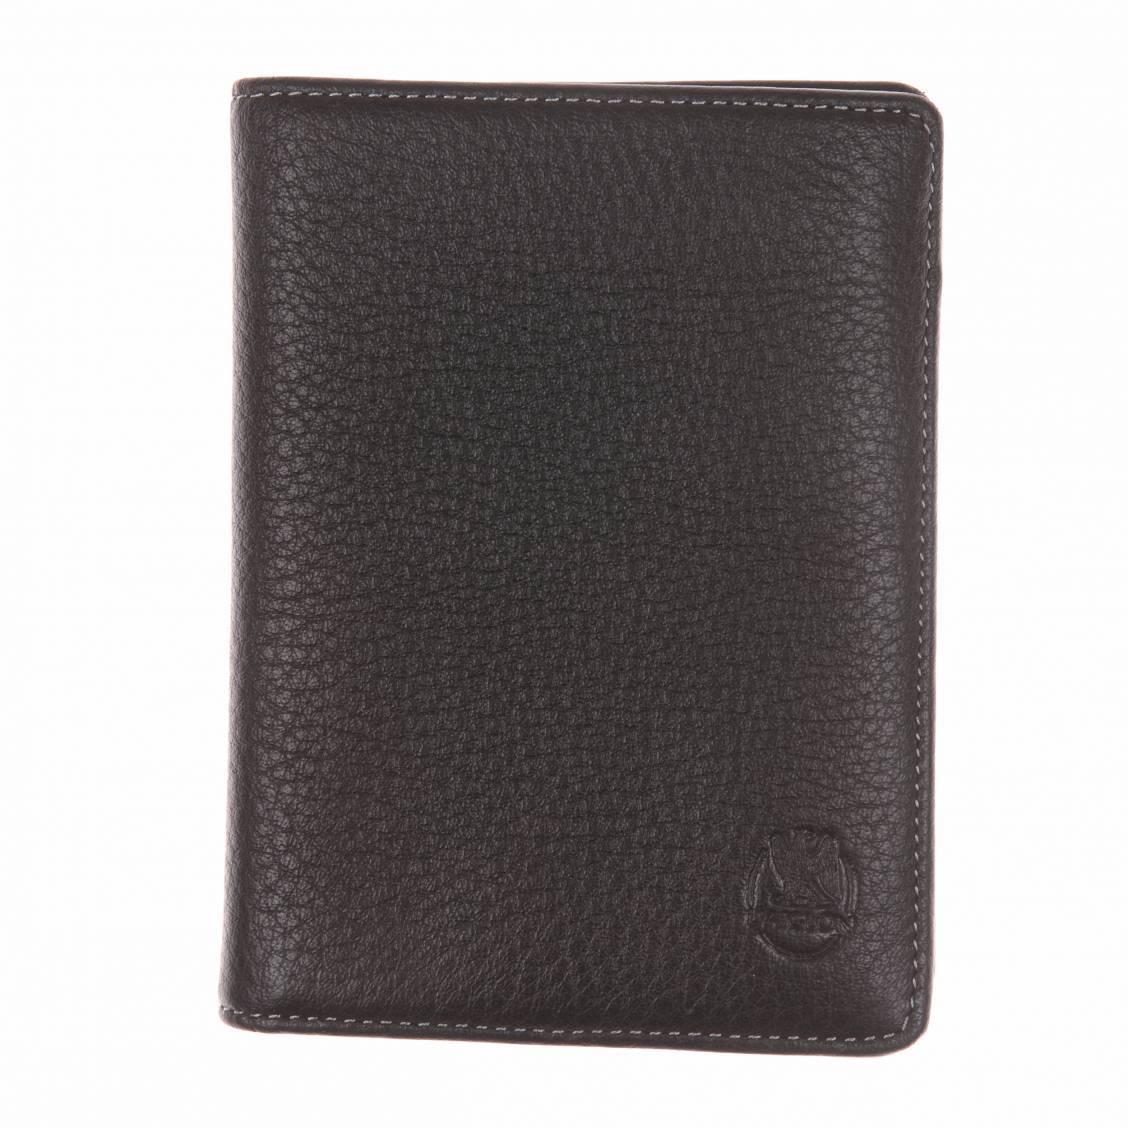 portefeuille européen en cuir noir